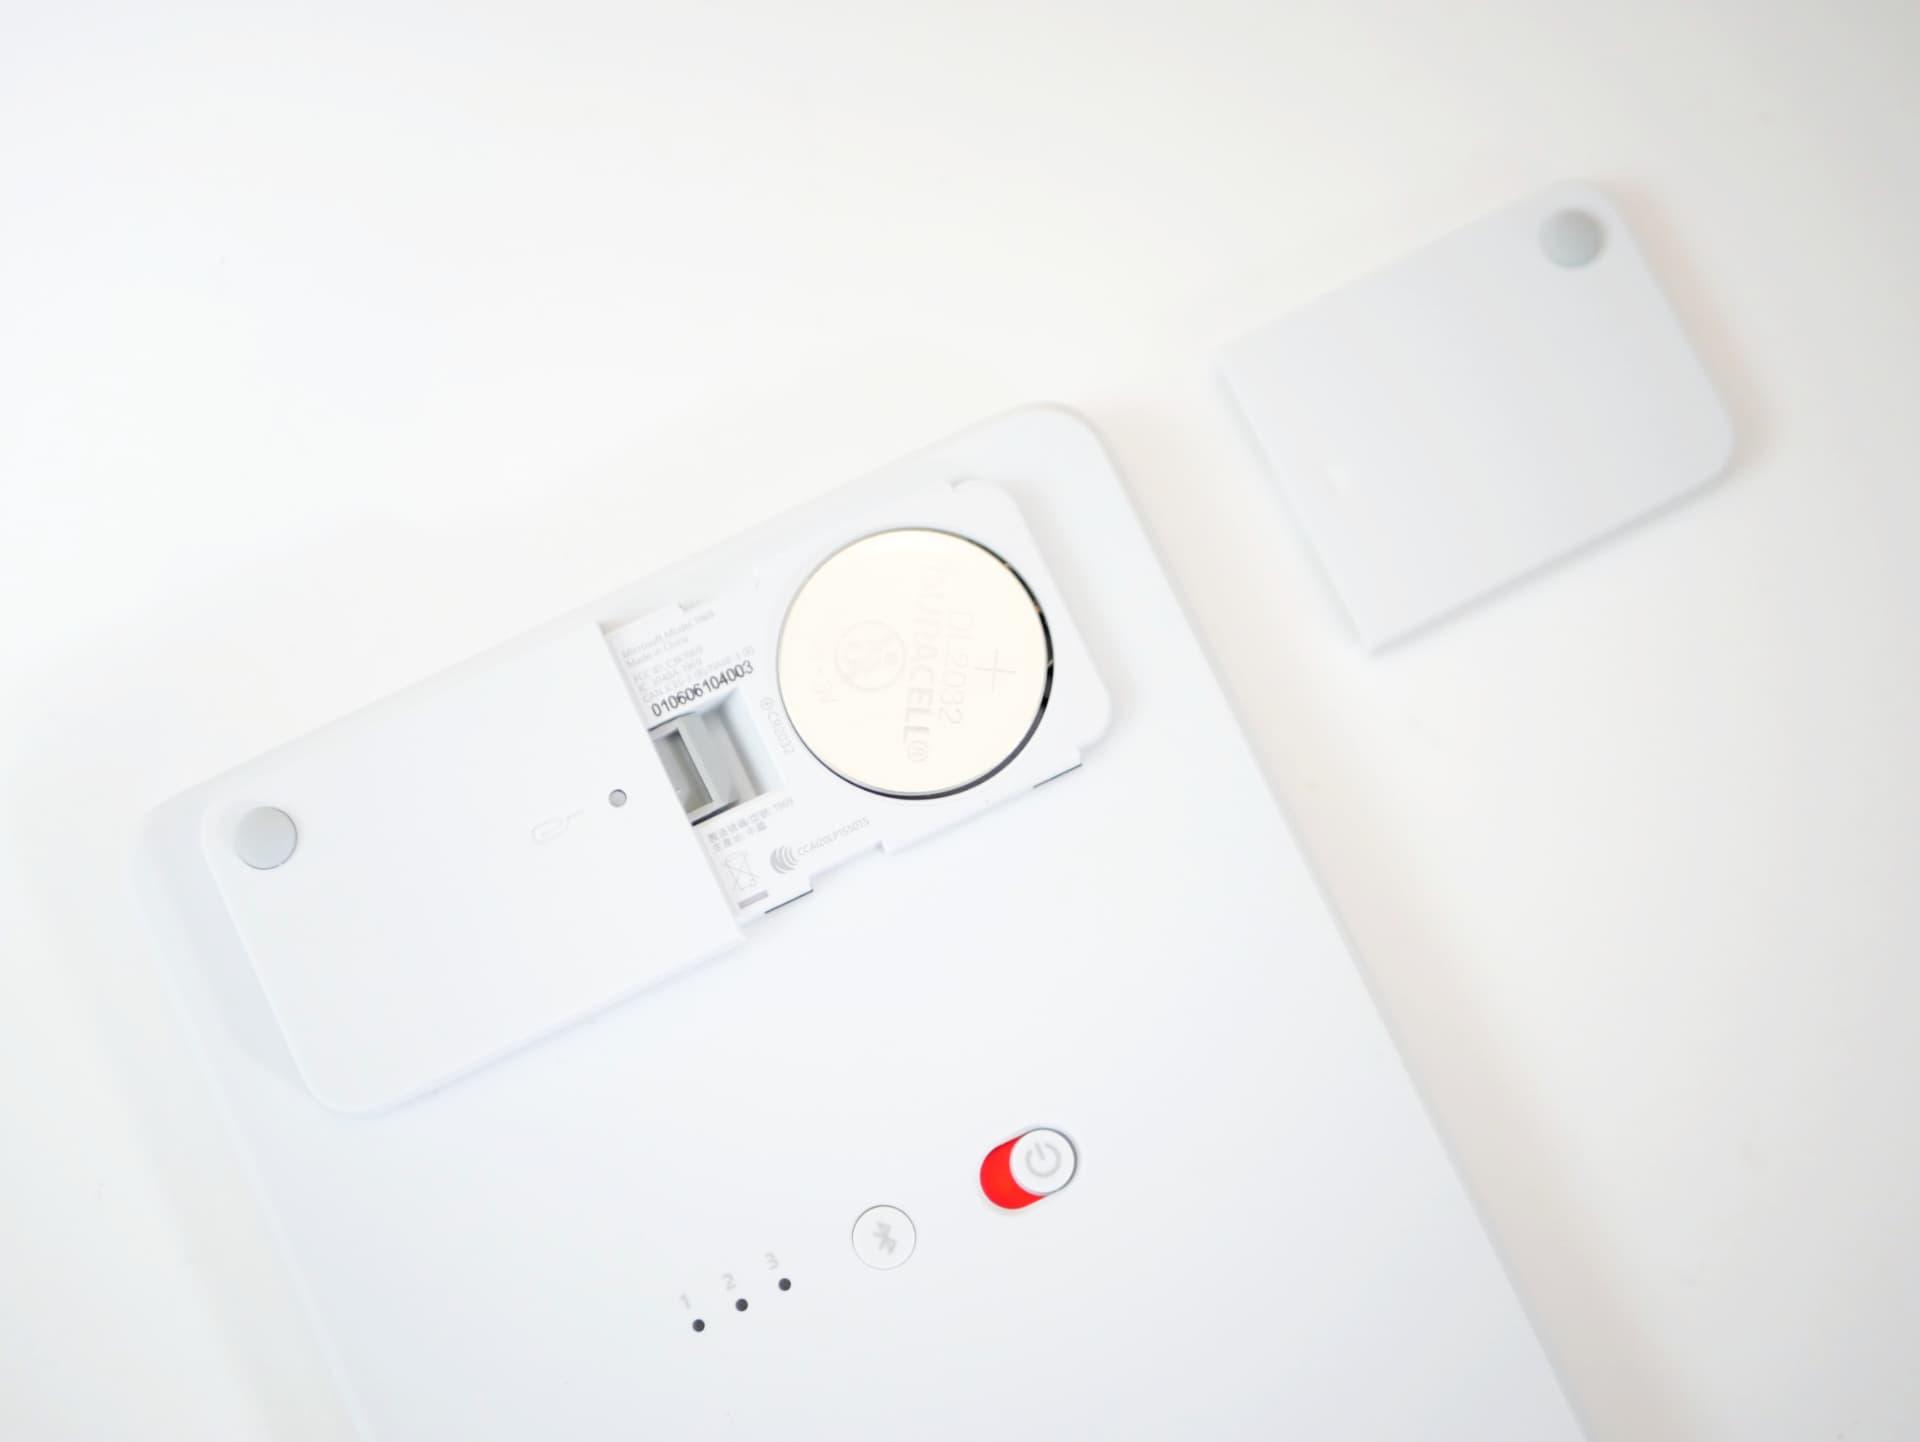 Microsoft Number Pad コイン電池